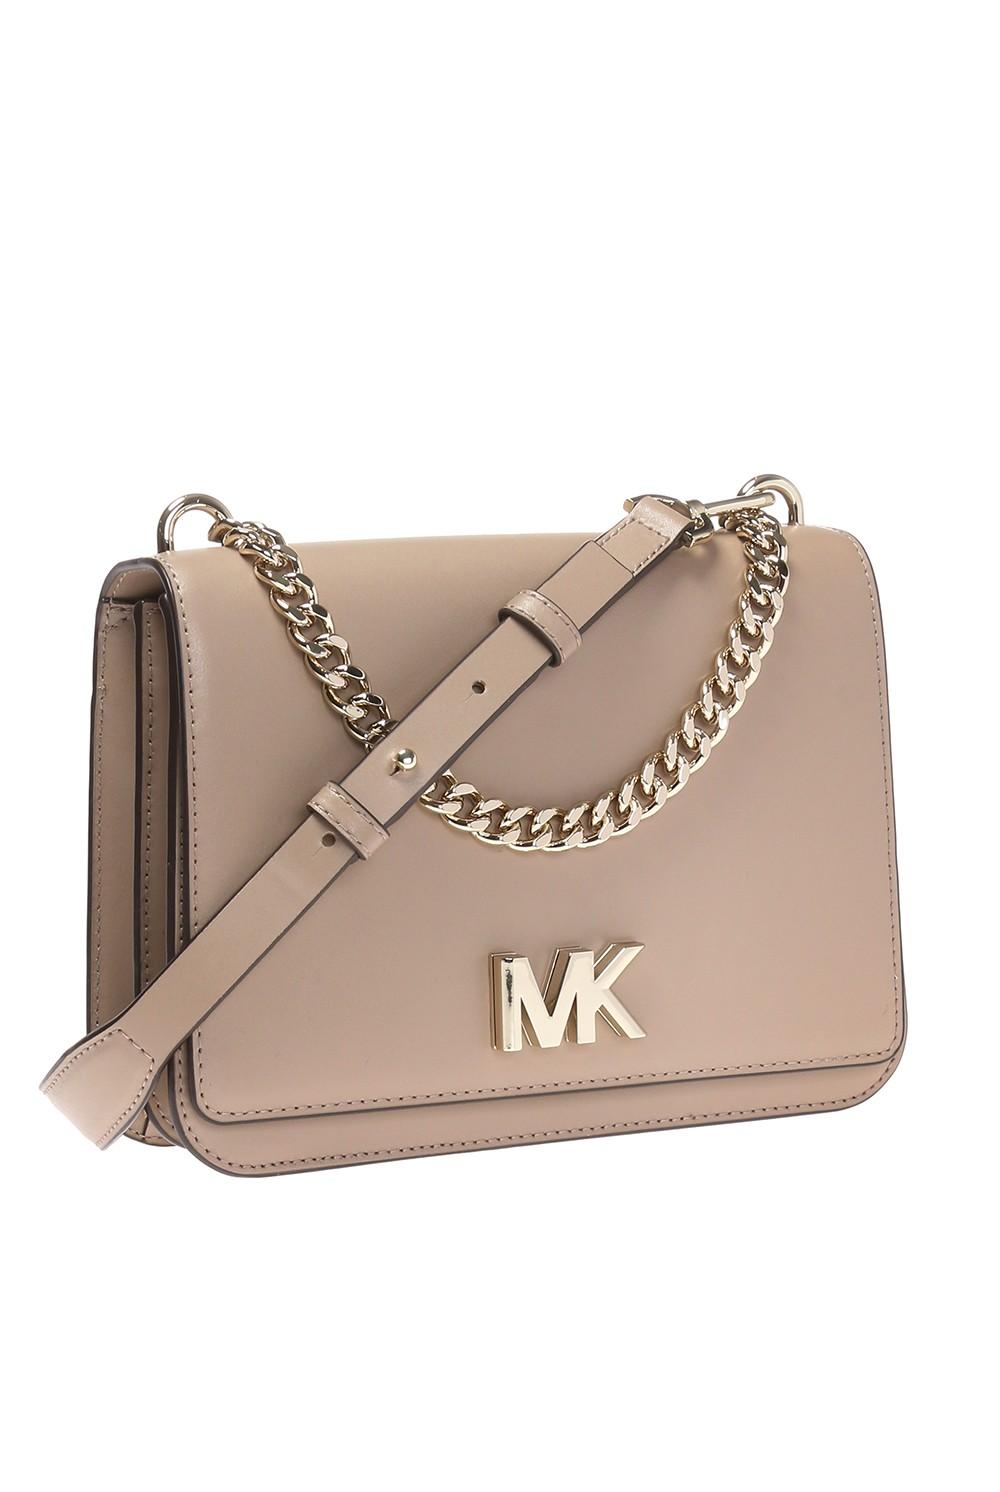 Michael Michael Kors 'MOTT' shoulder bag